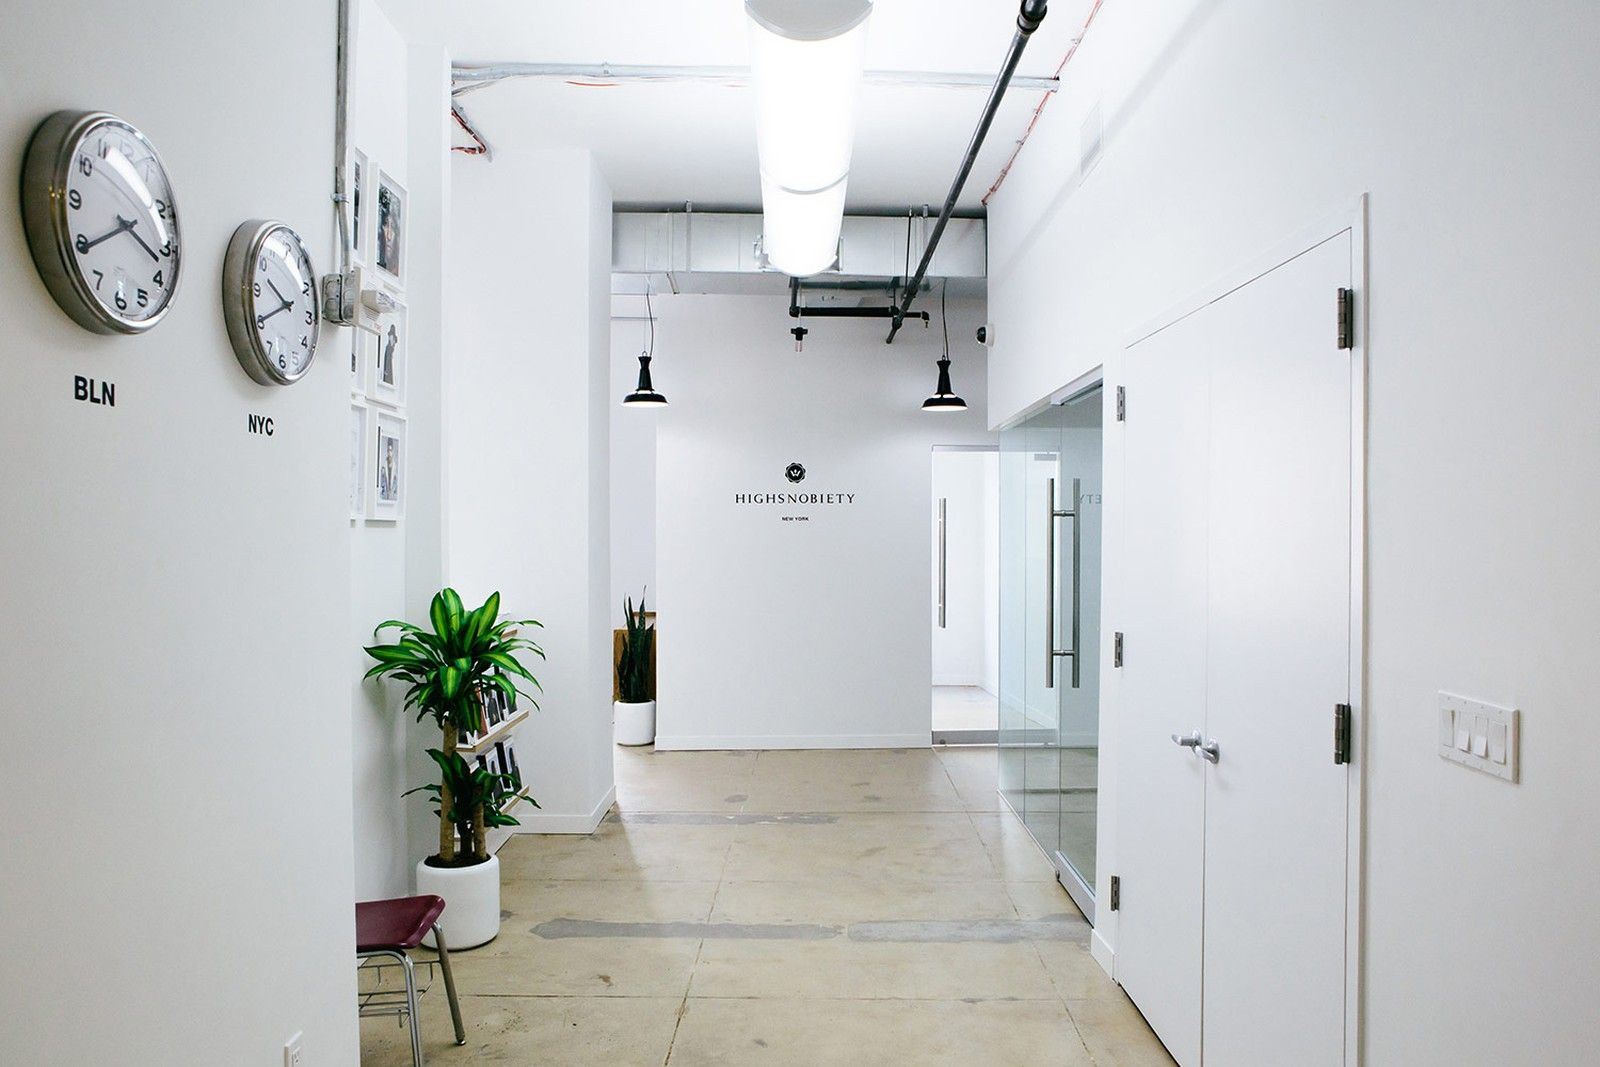 Highsnobiety-New-York-Office-Design-08